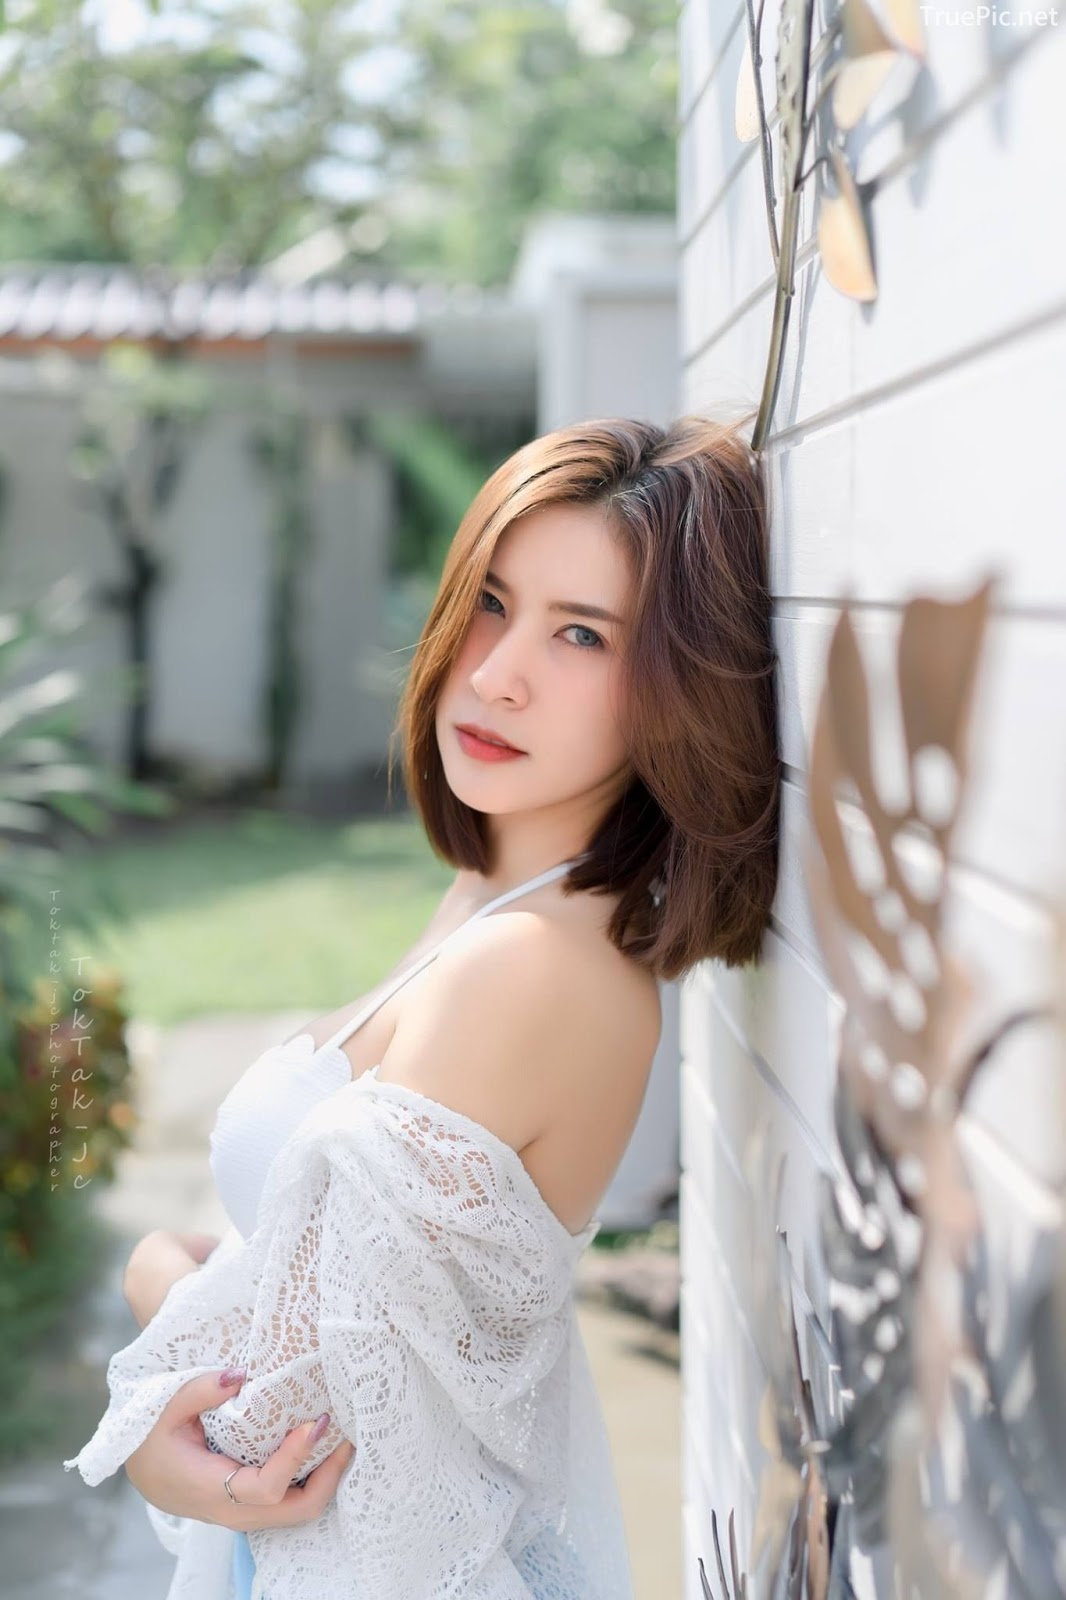 Thailand hot model MIldd Thanyarath Sriudomloert - Sexy 2 Piece Swimsuits - Picture 1